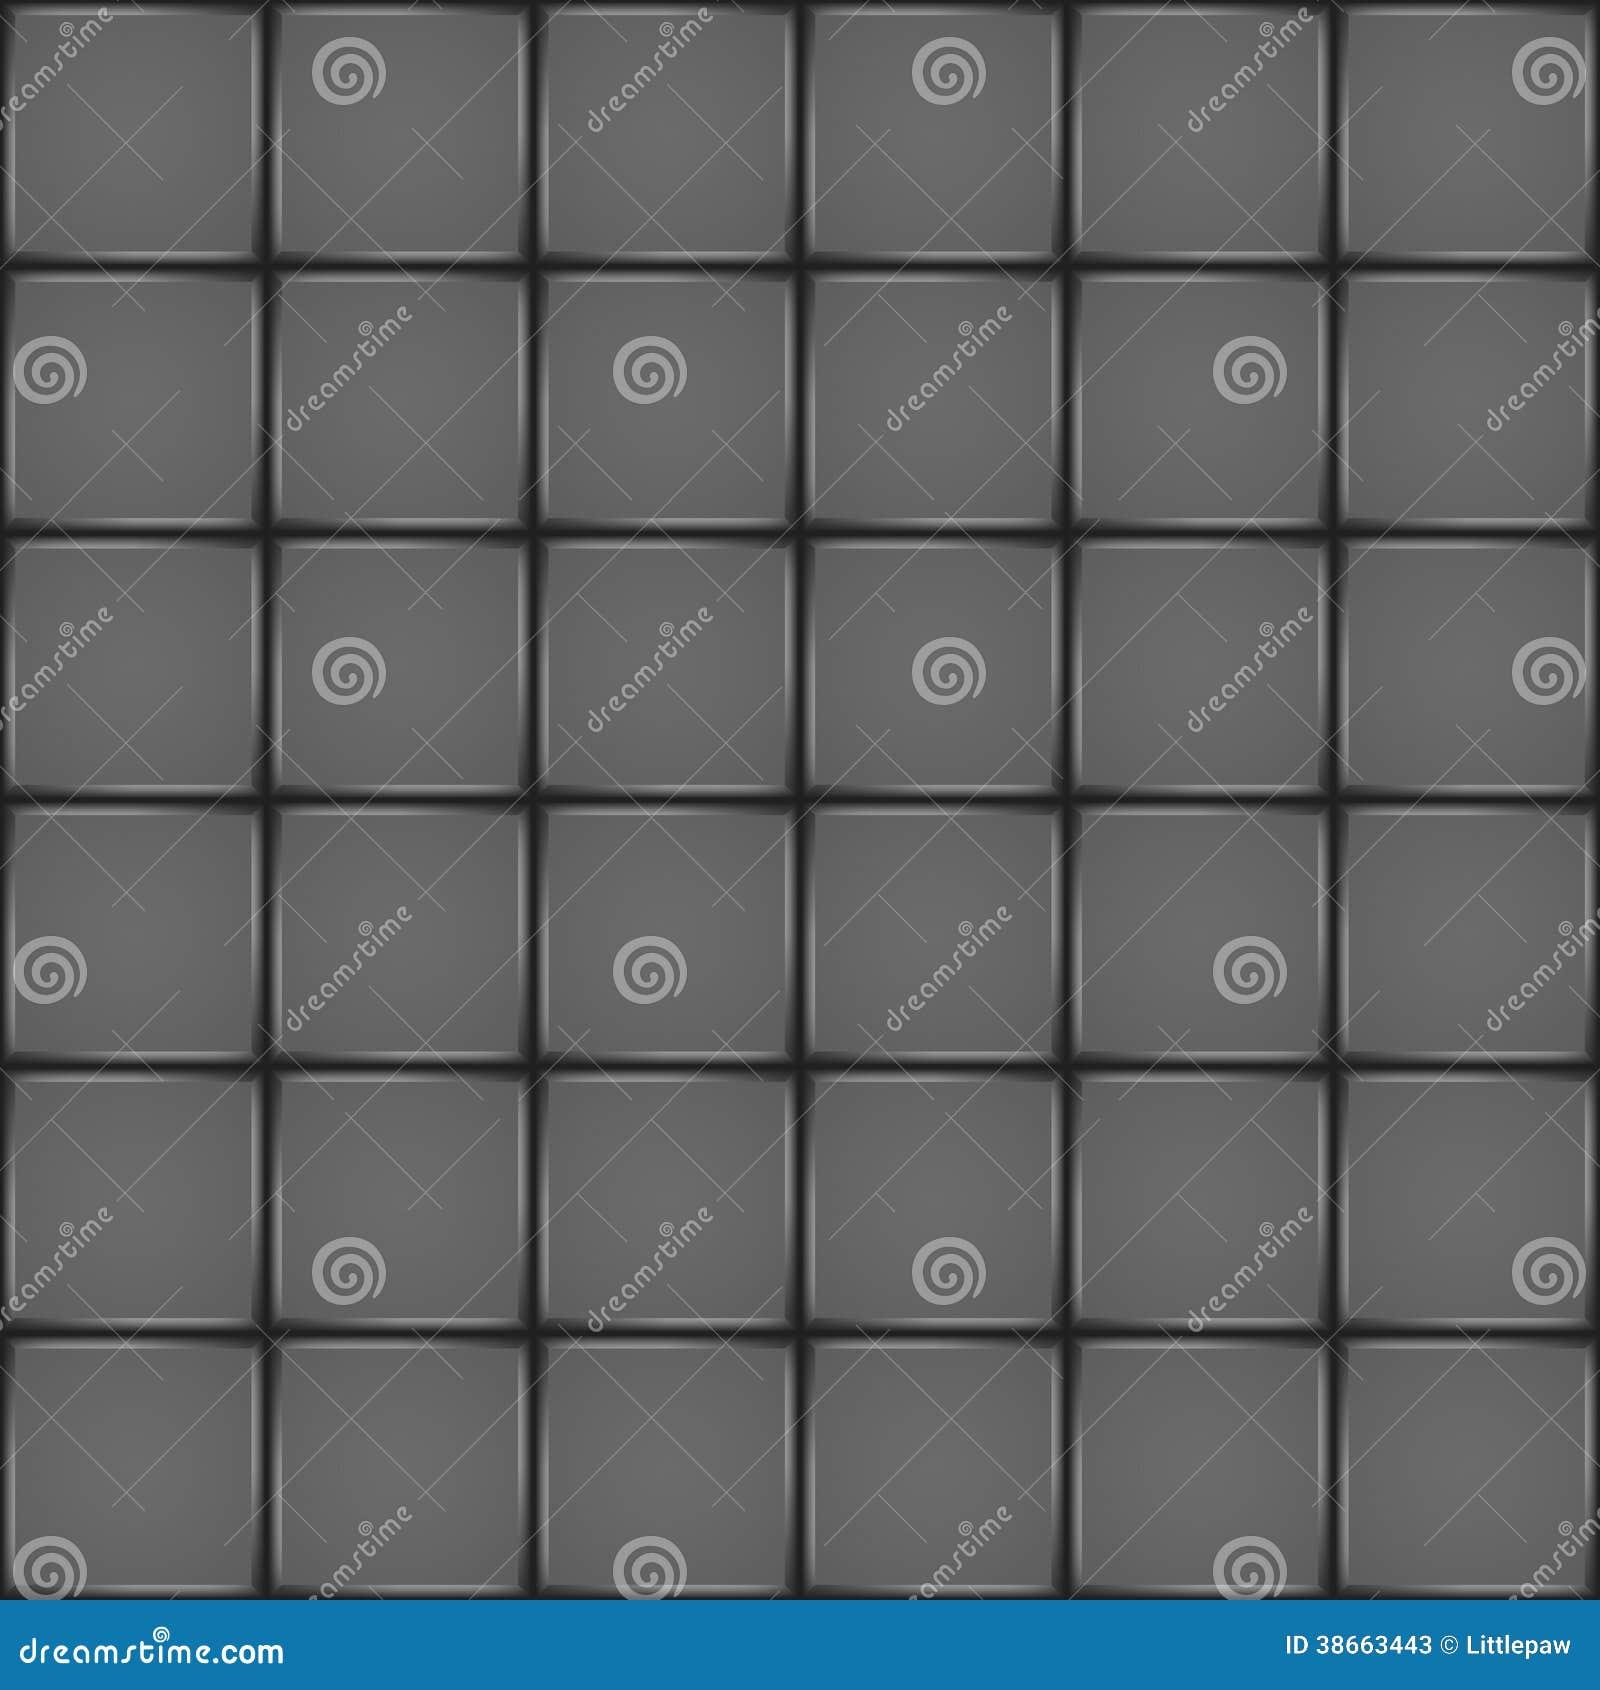 Dark Ceramic Tile Seamless Pattern Stock Vector Illustration Of